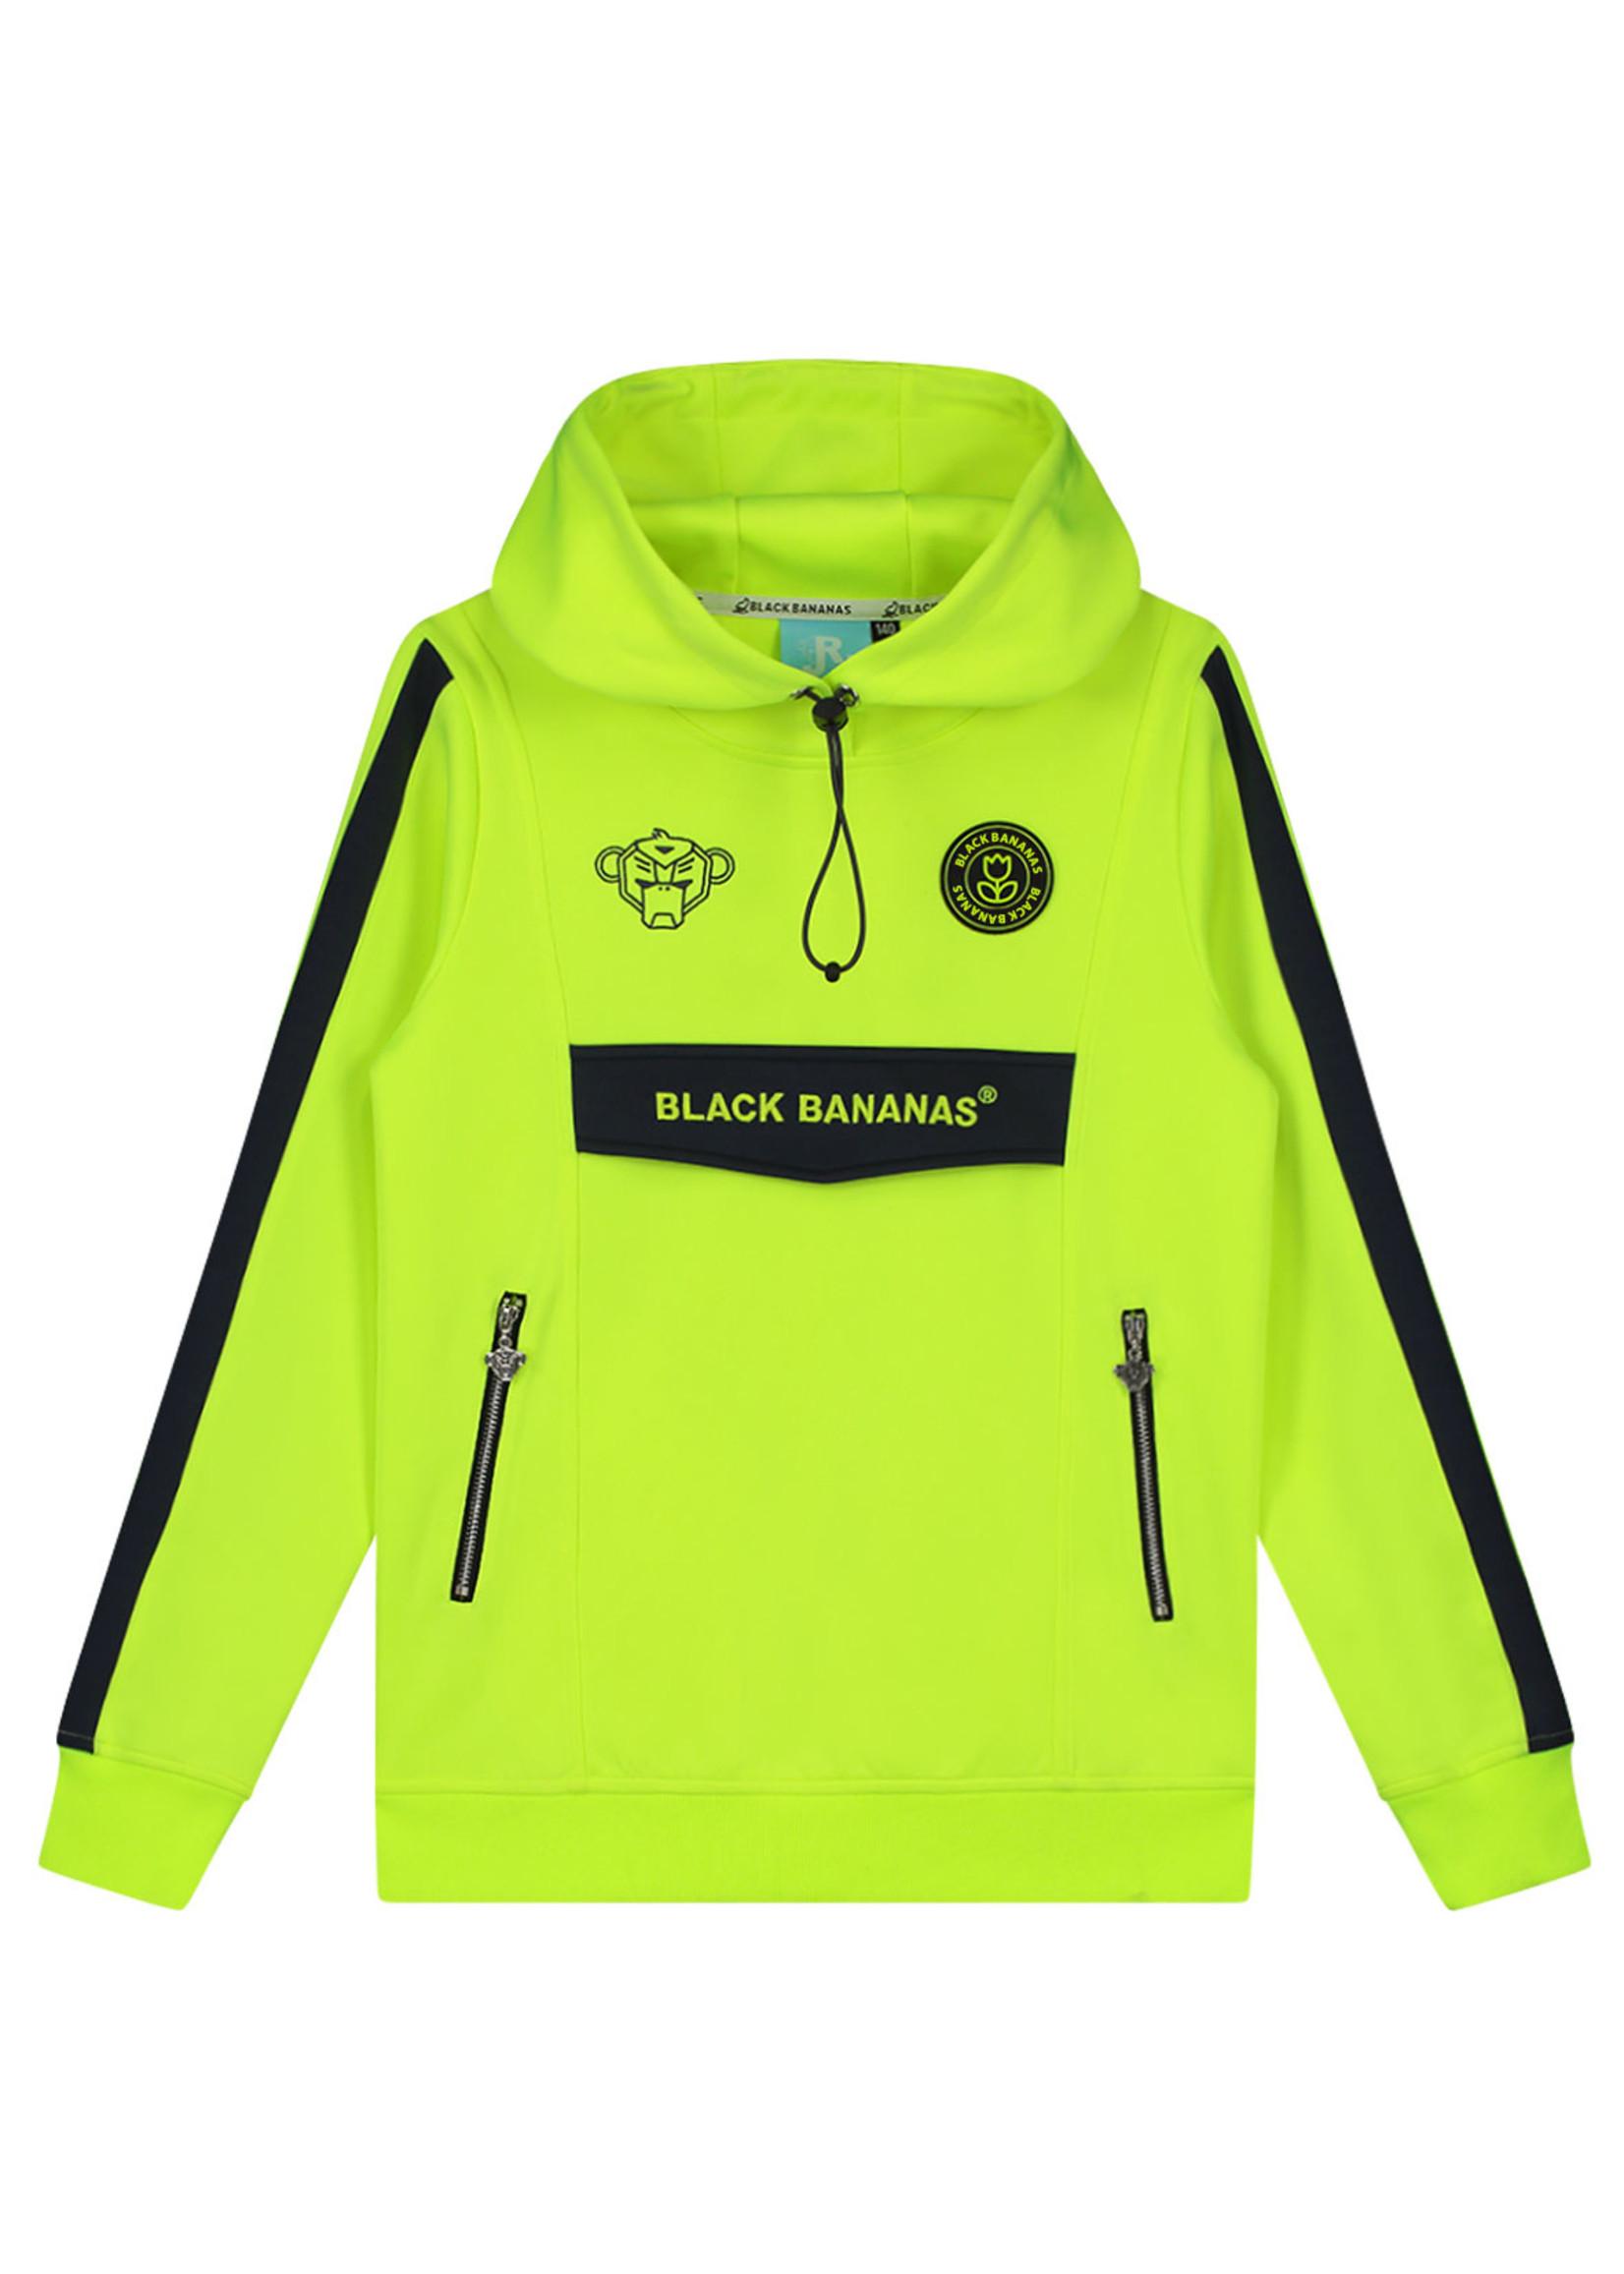 Black Bananas BlackBananas Jr. Anorak Match Tracktop neon yellow